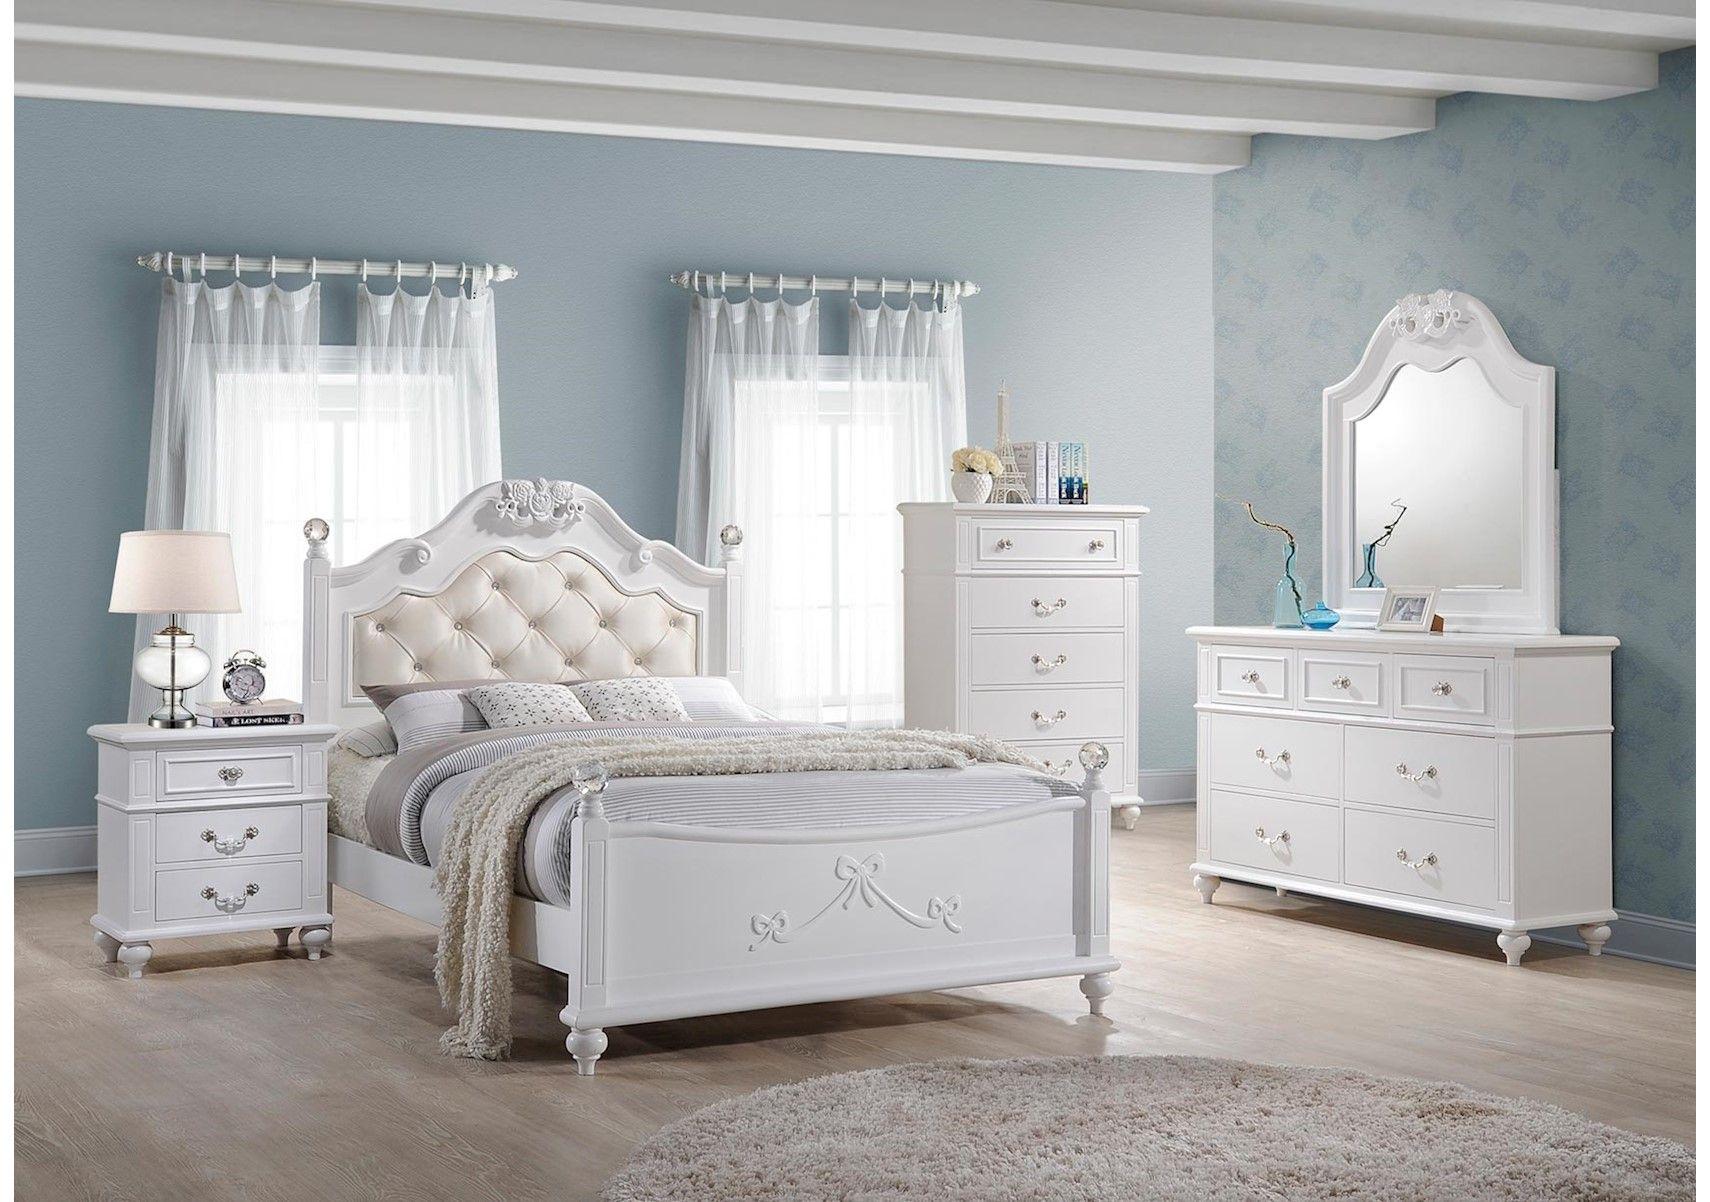 Lacks Alana 4 Pc Kids Full Bedroom Set Twin Bedroom Sets Girls